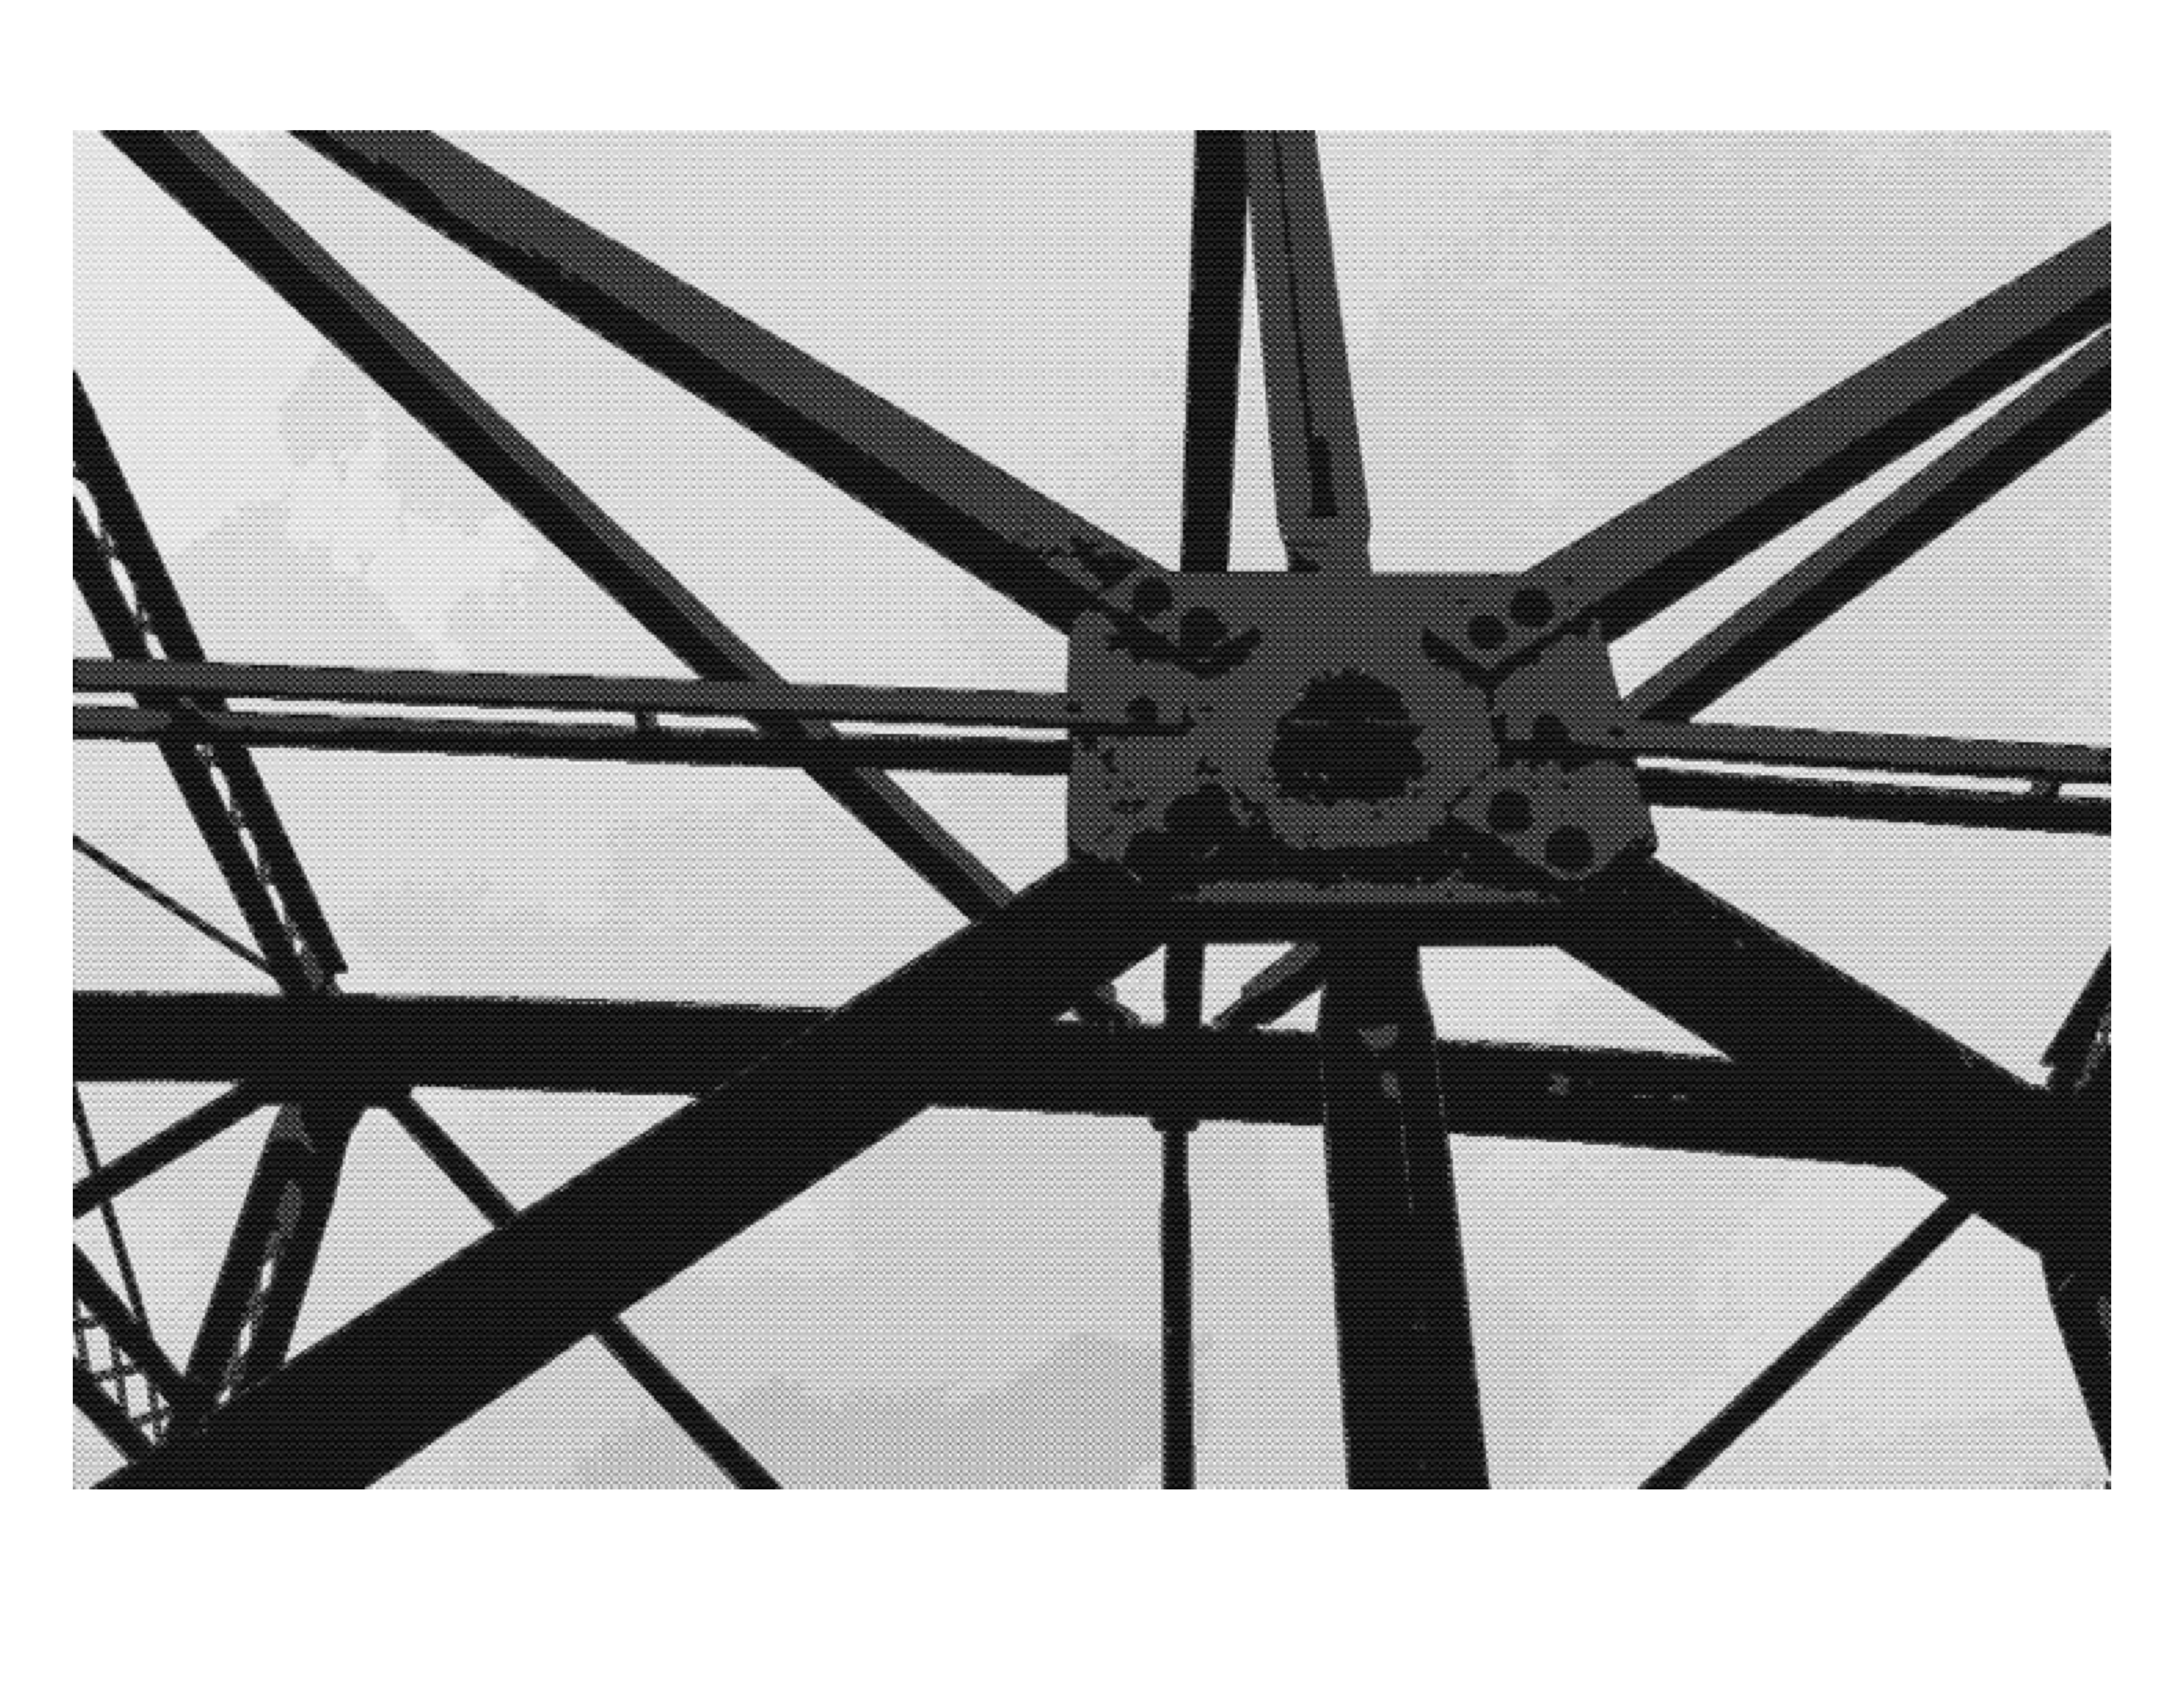 Bridge study 1, computer altered image